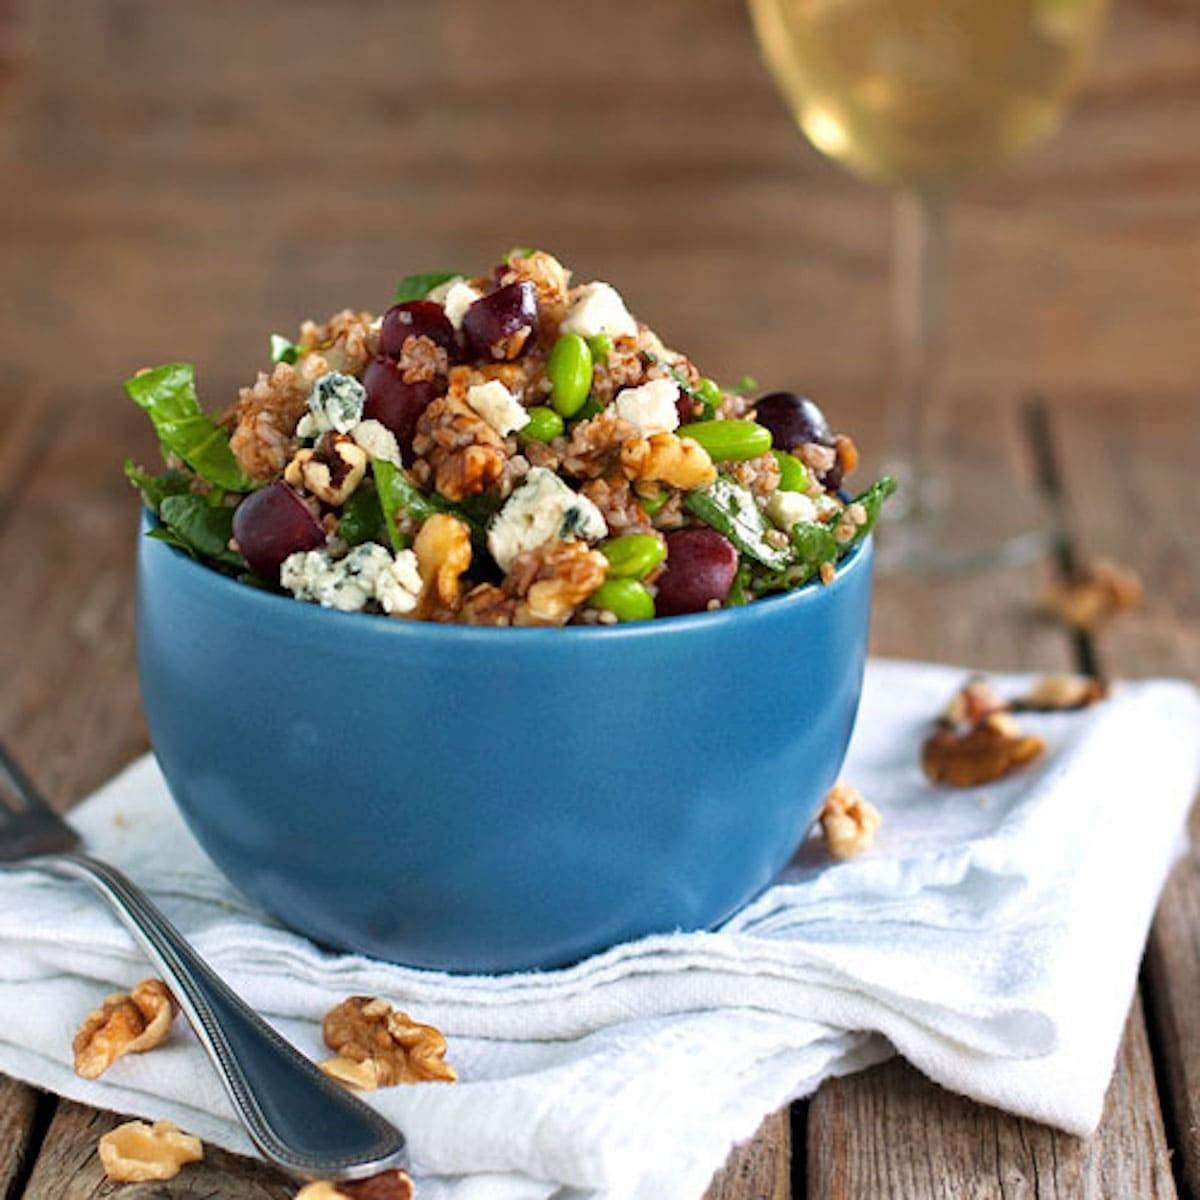 Honey walnut power salad in a blue bowl.